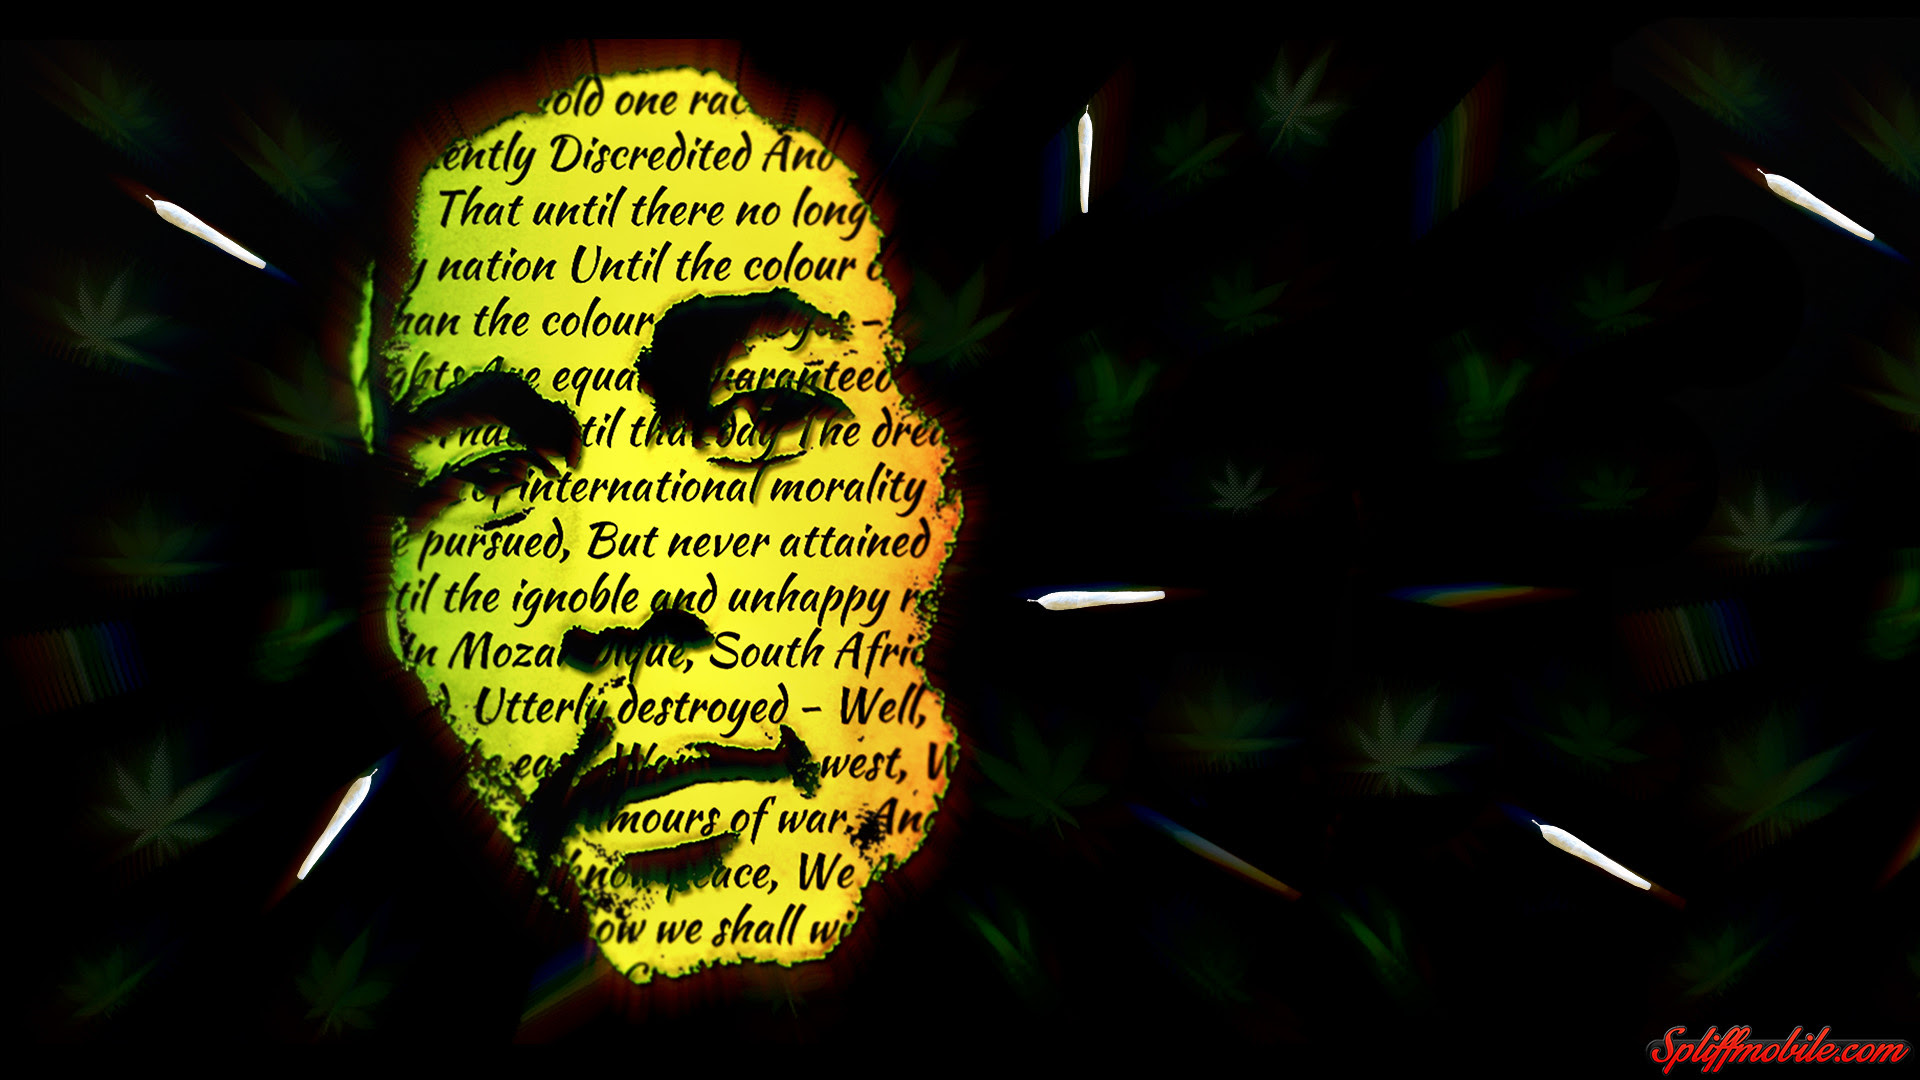 Bob Marley Quotes Wallpaper 73 Images